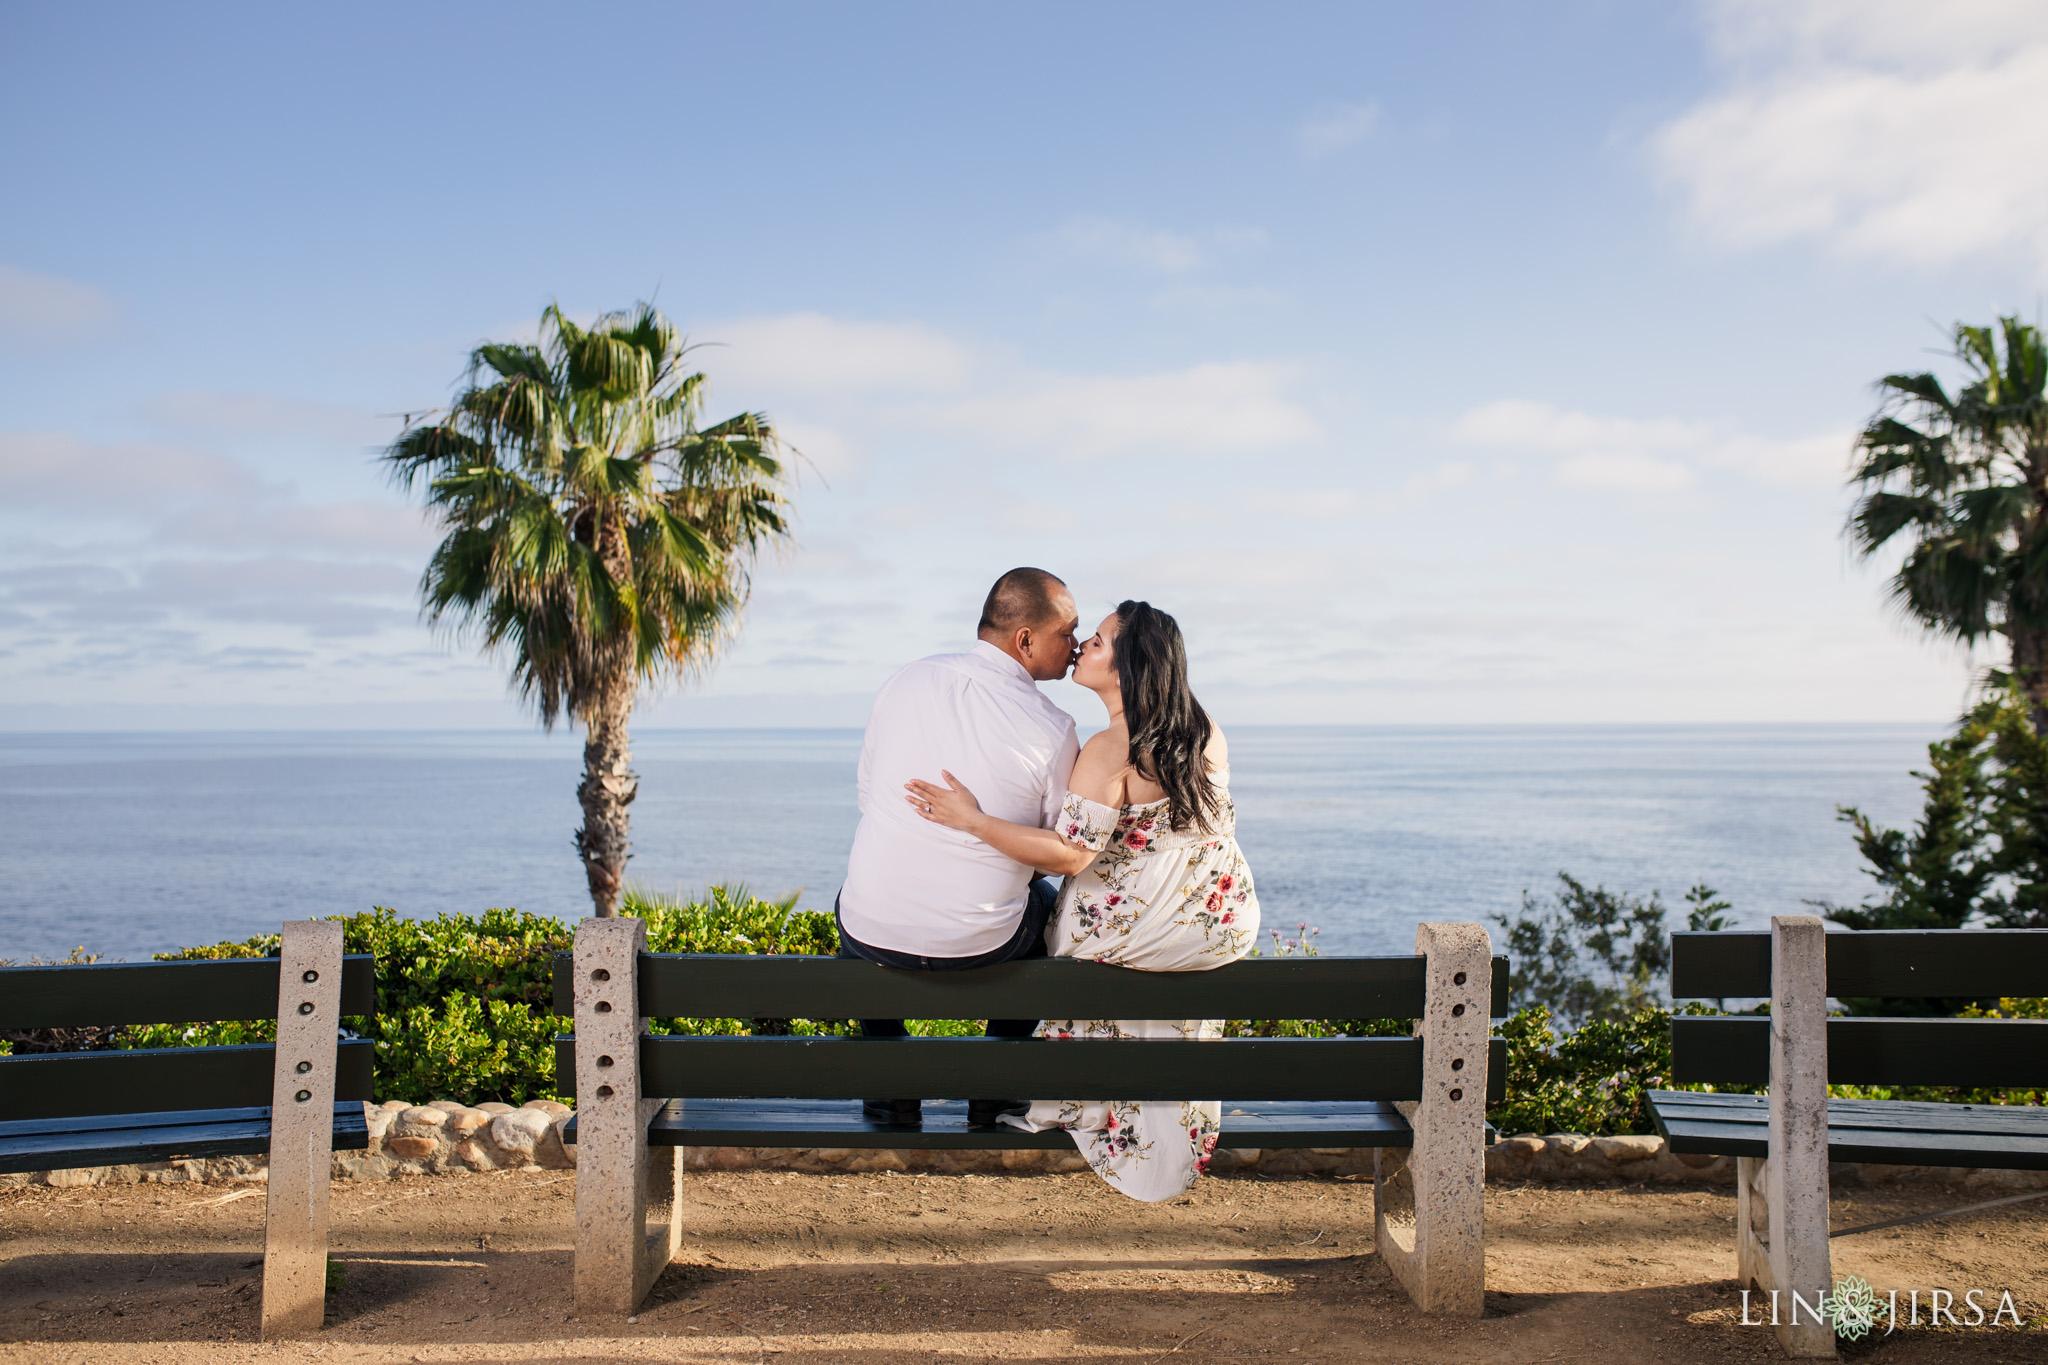 04 Heisler Park Orange County Engagement Photographer